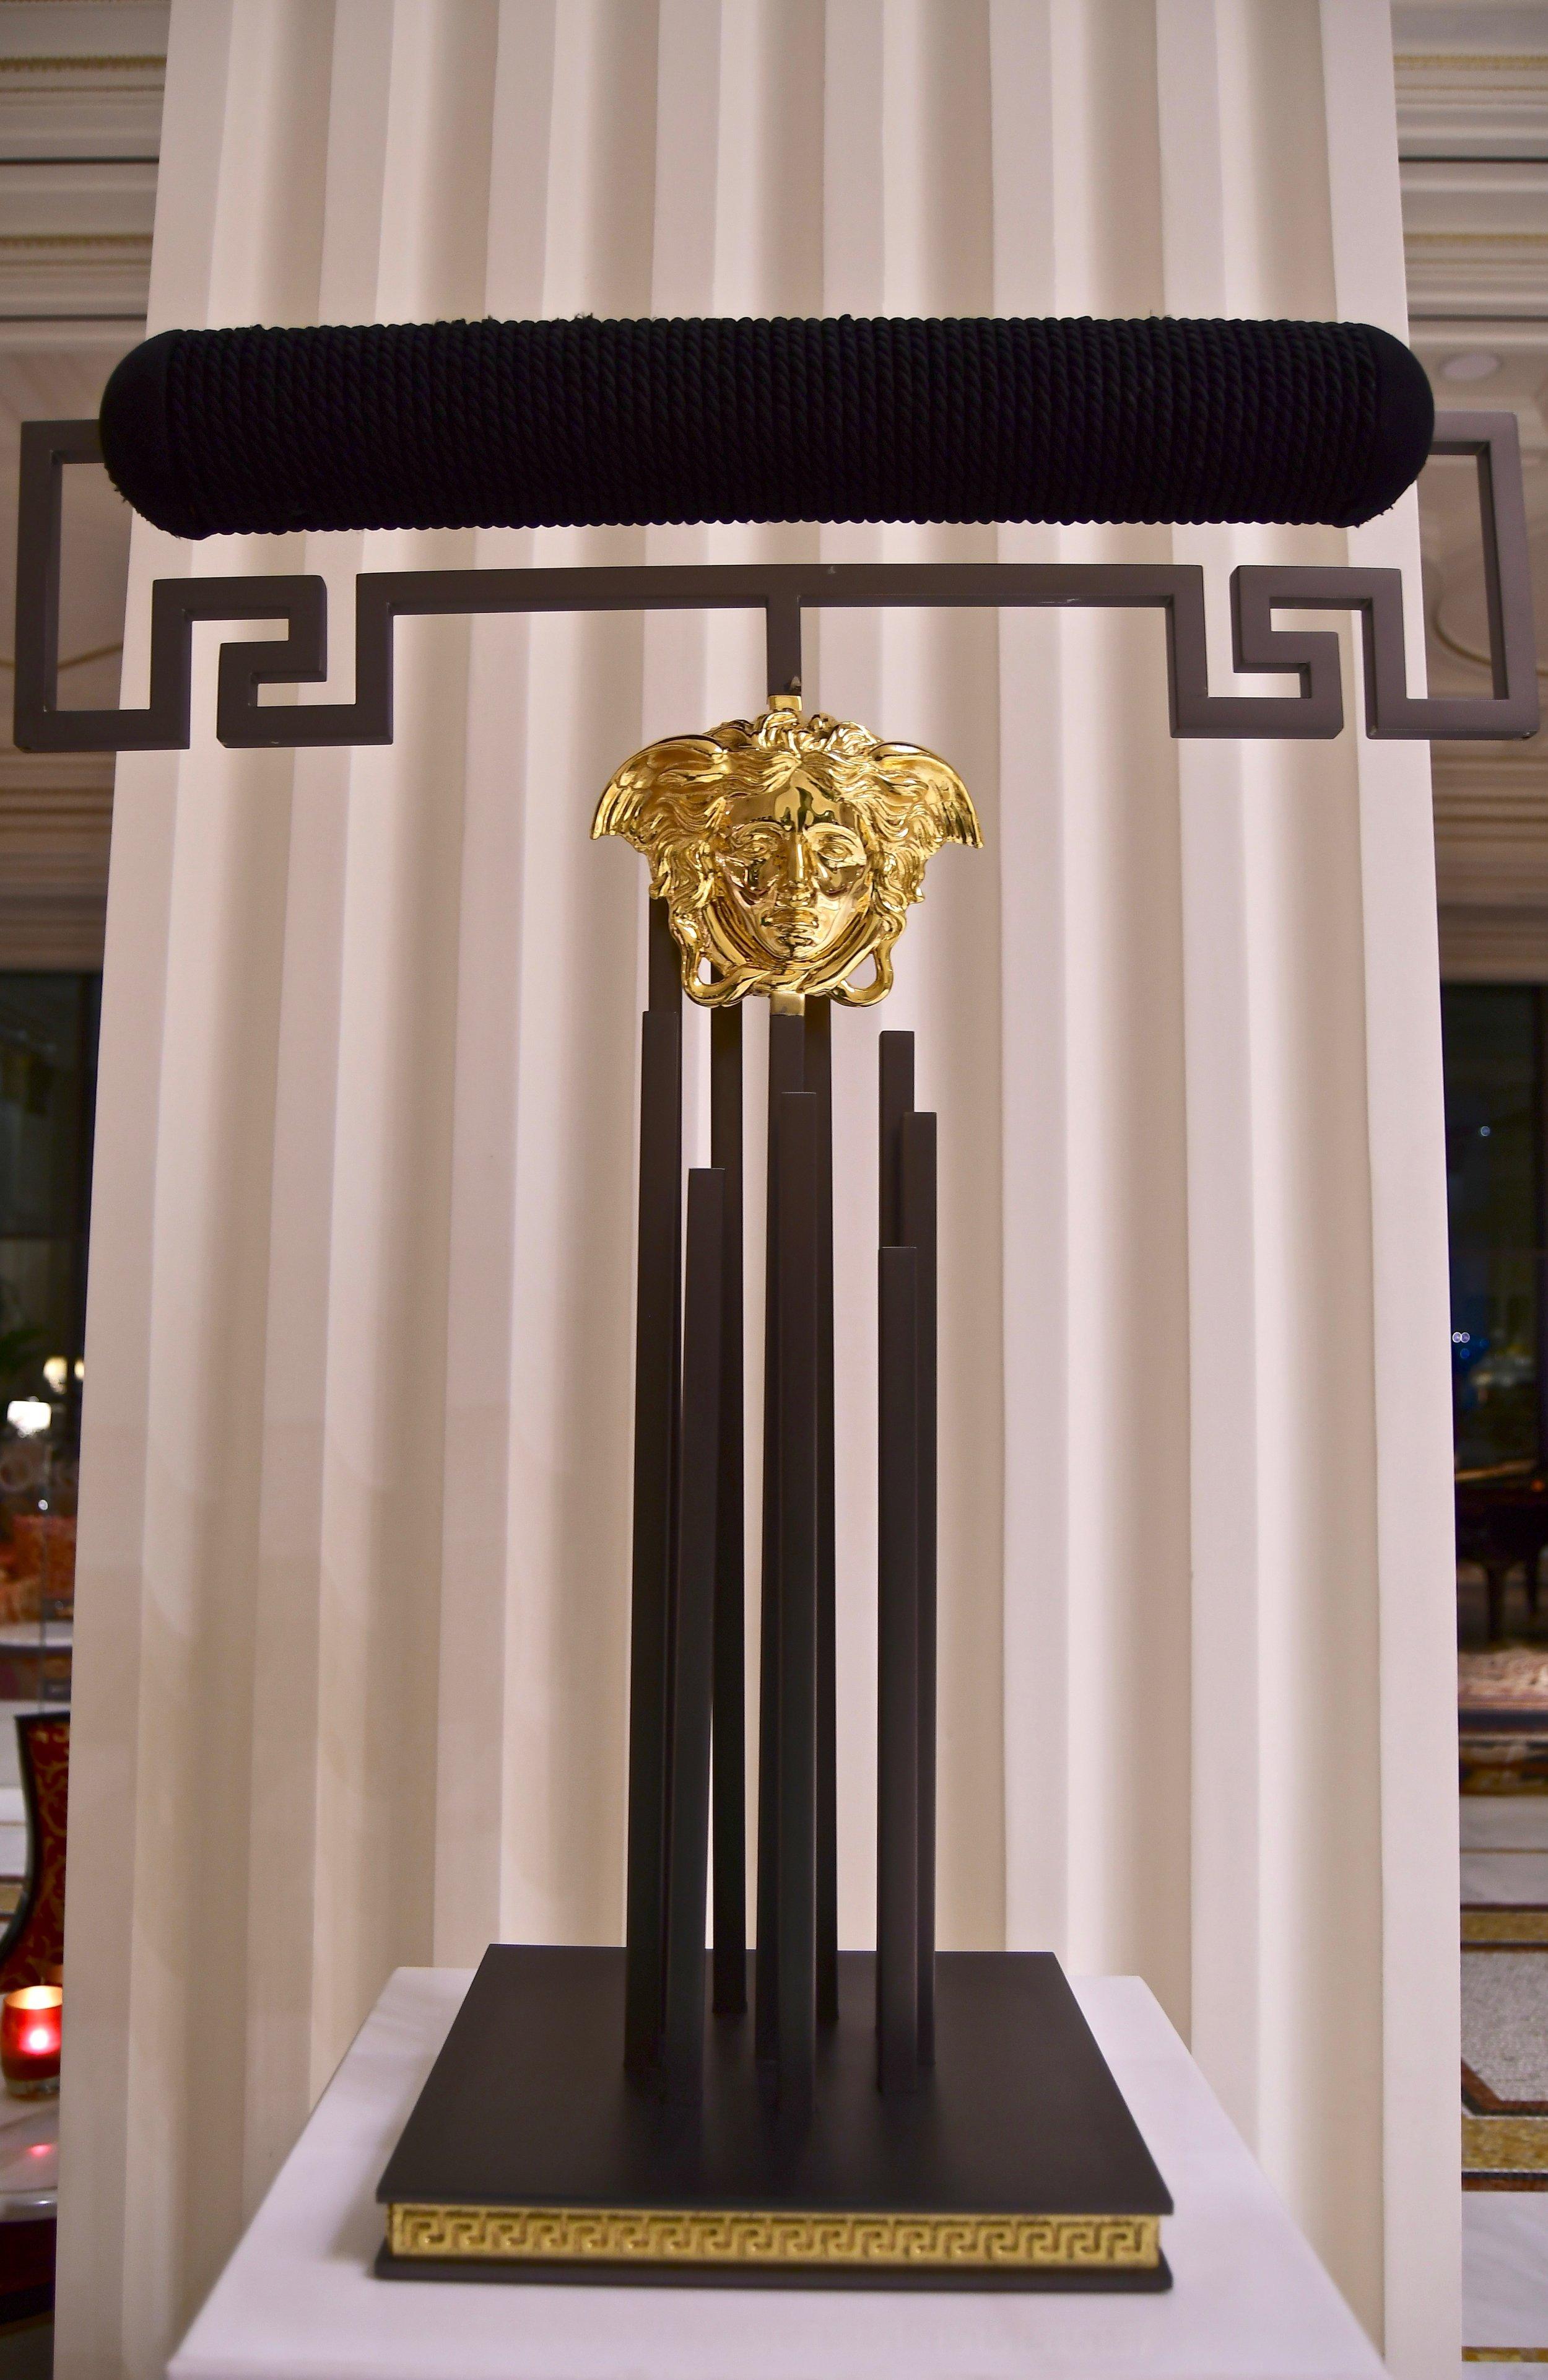 Hotel Lobby - Falcon Stand (Palazzo Versace Dubai)